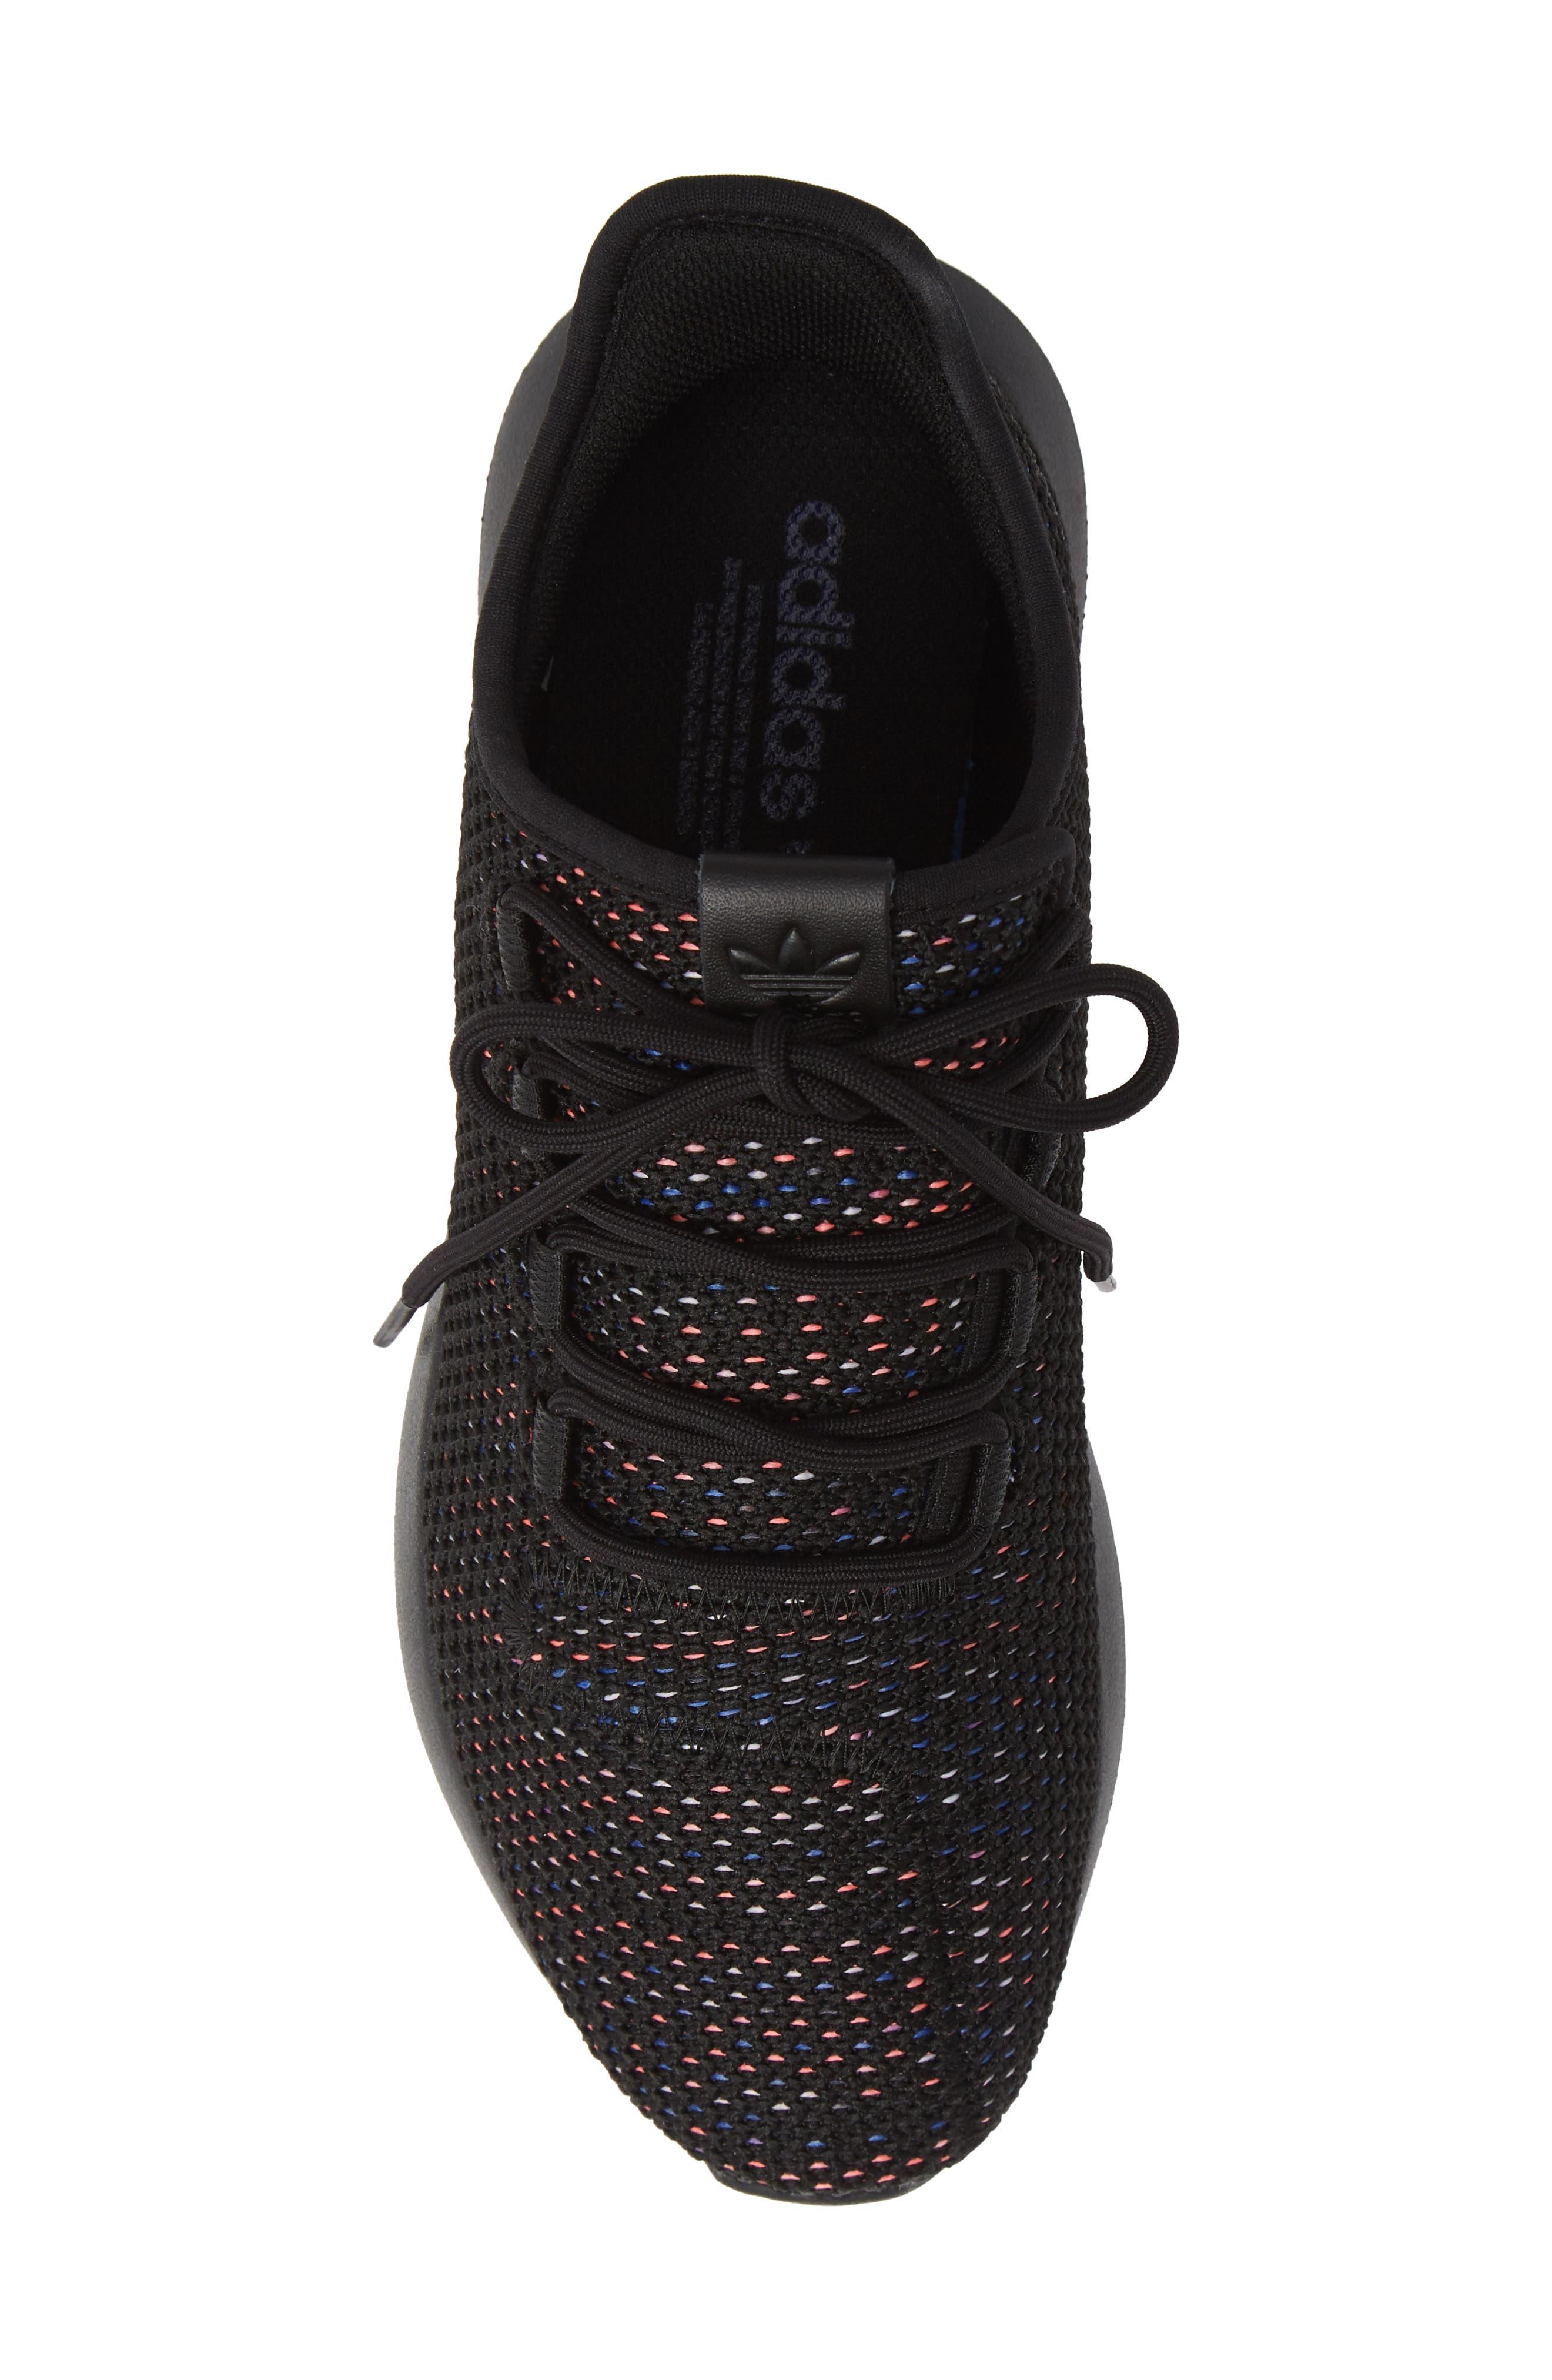 Tubular Shadow CK Sneaker,                             Alternate thumbnail 5, color,                             BLACK/ SOLAR RED/ MYSTERY INK